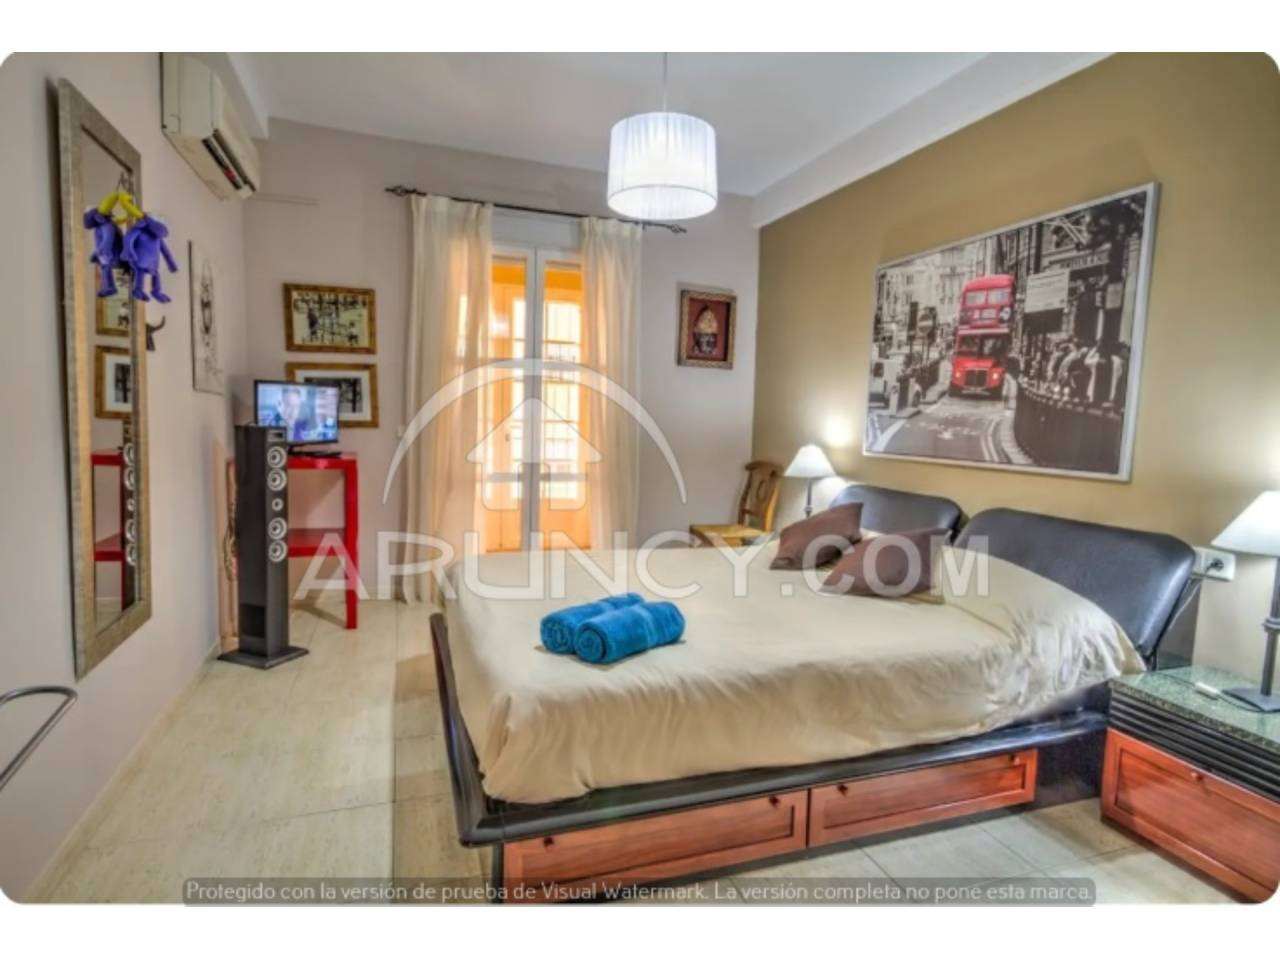 Apartamento en Alquiler en Sevilla , Alcalá de Guadaíra